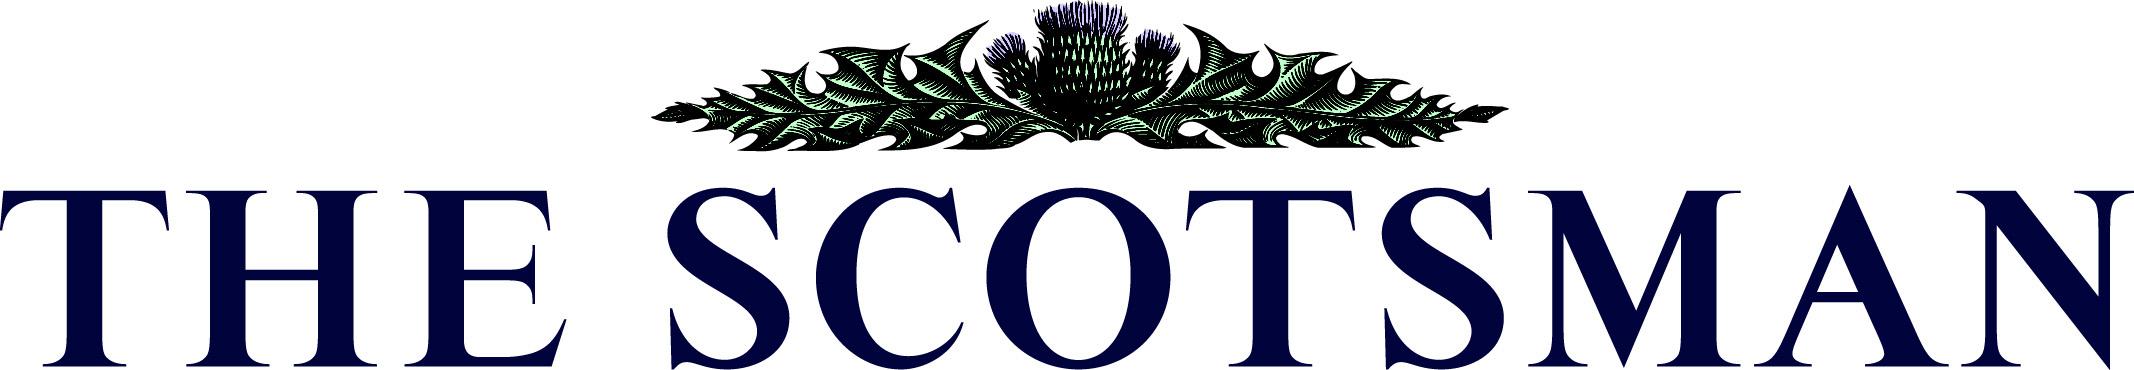 Scotsman-logo.jpg